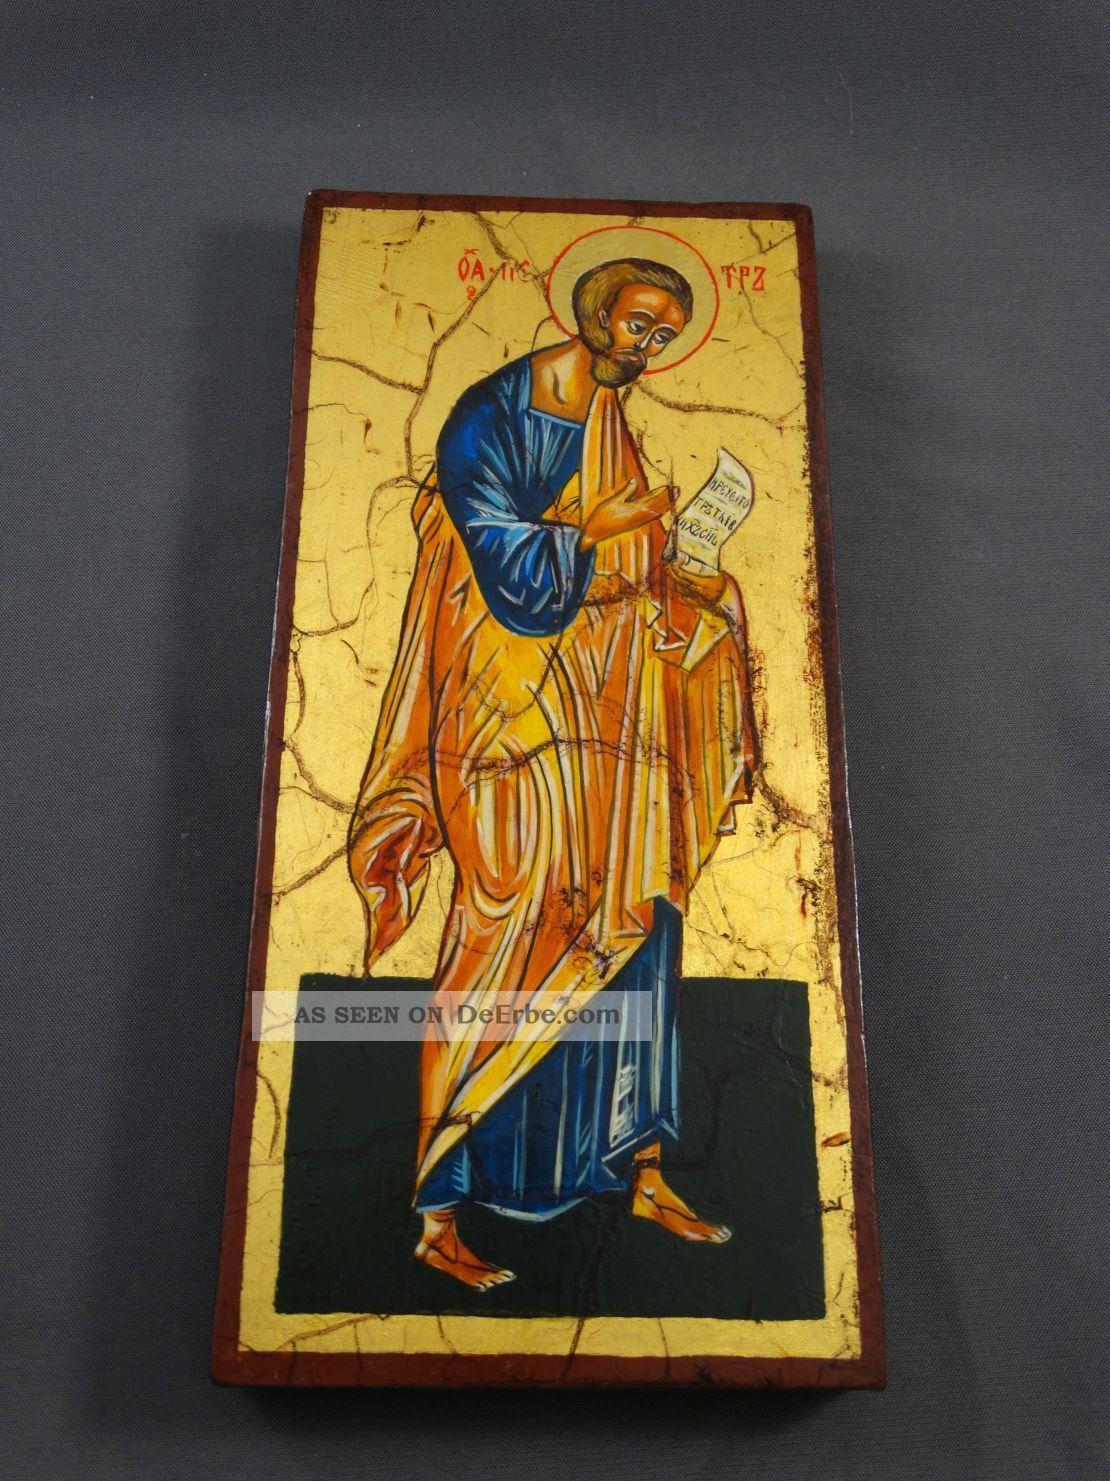 Ikone Icon Heiligenbild Apostel Petrus - Fürbitt Reihe - Handgemalt Ikonen Bild